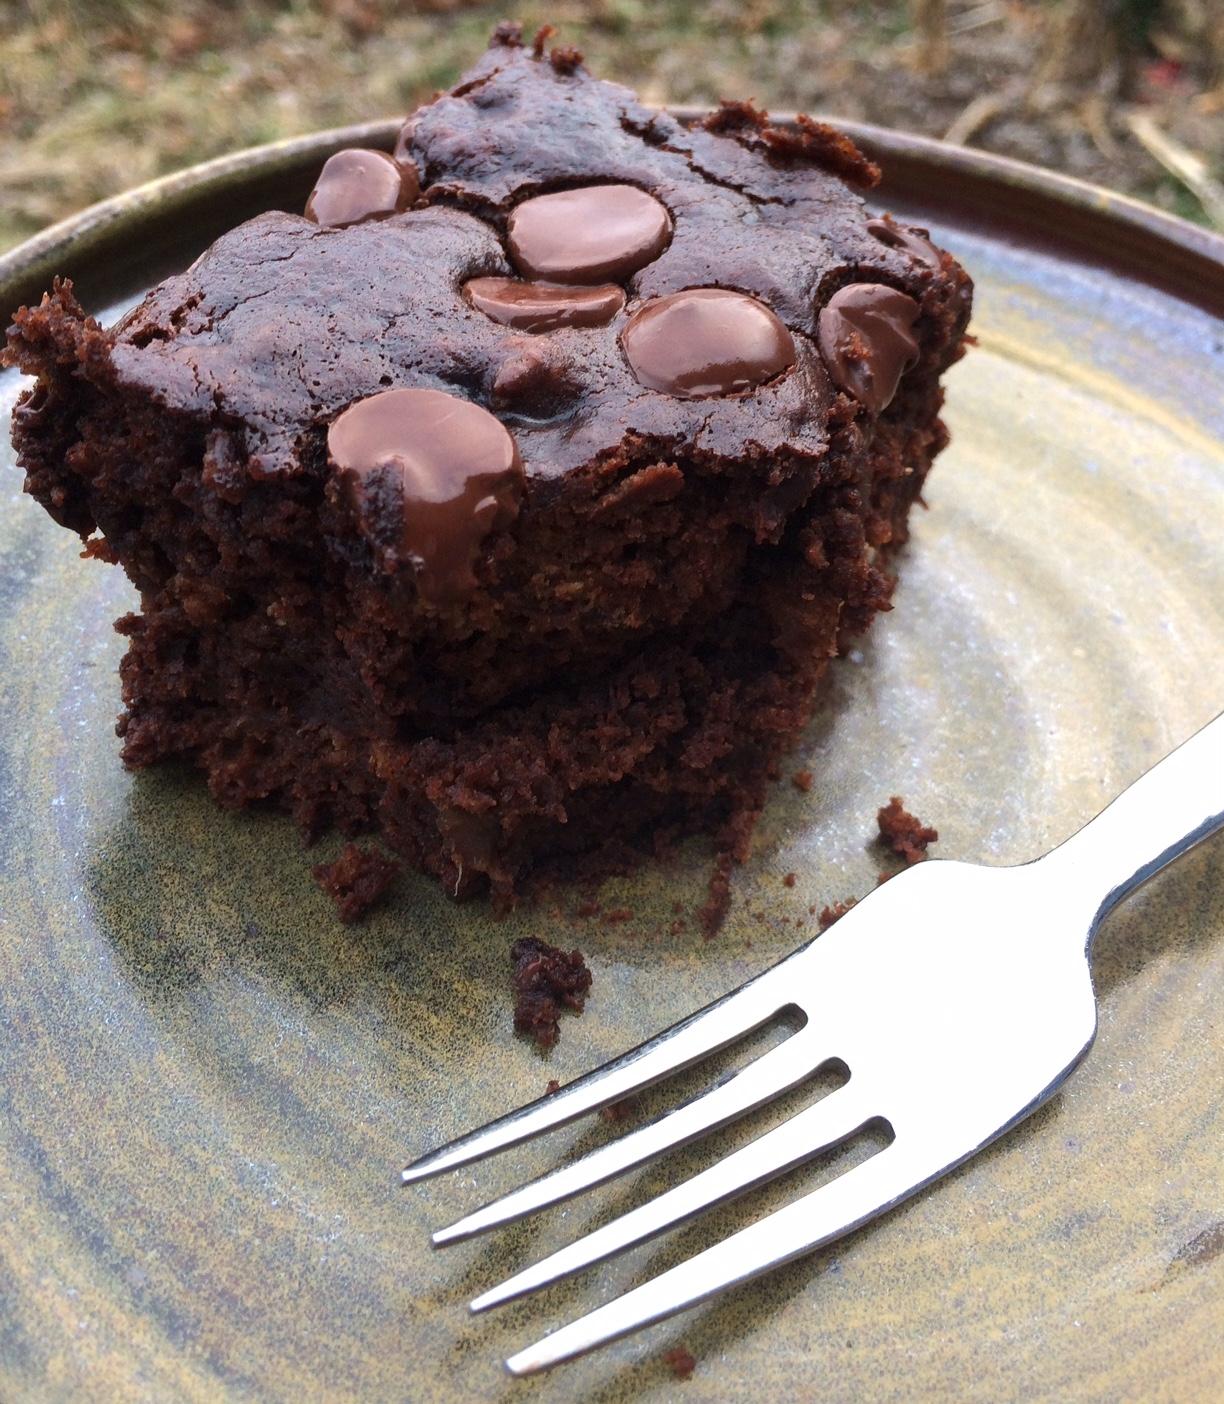 Snackcake ready for devouring.